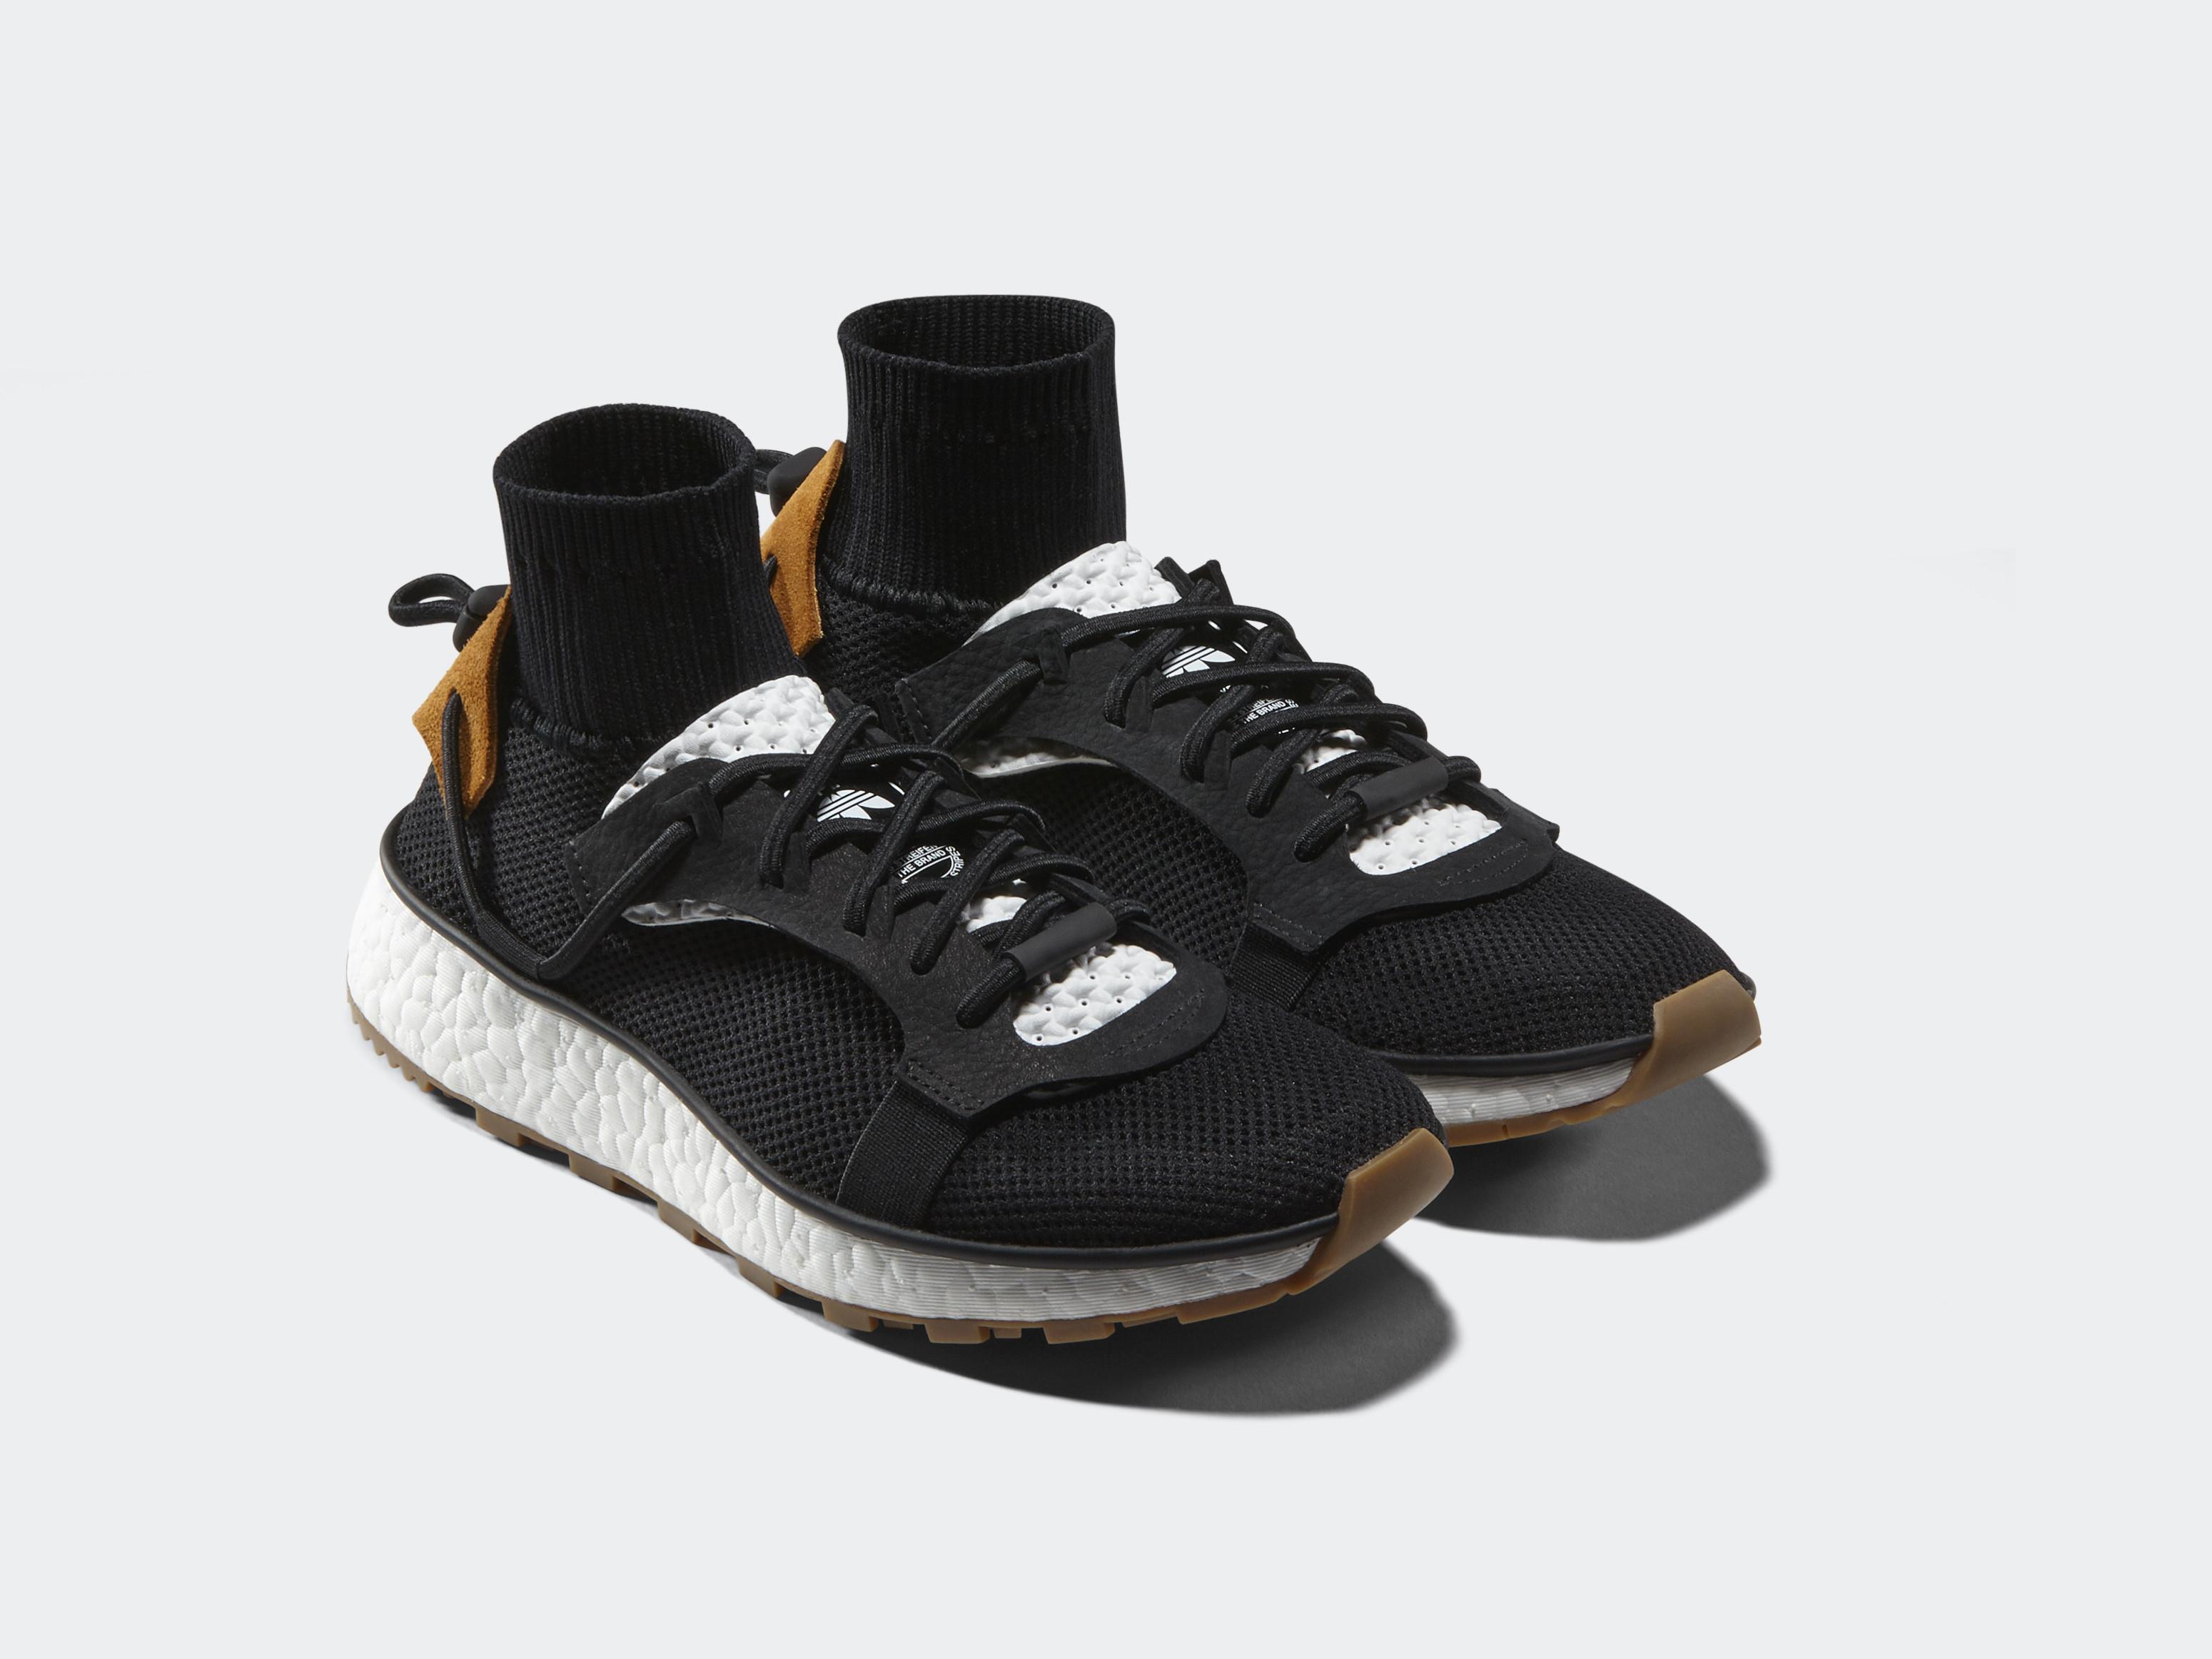 Adidas Originals by Alexander Wang Collection   Sole Collector